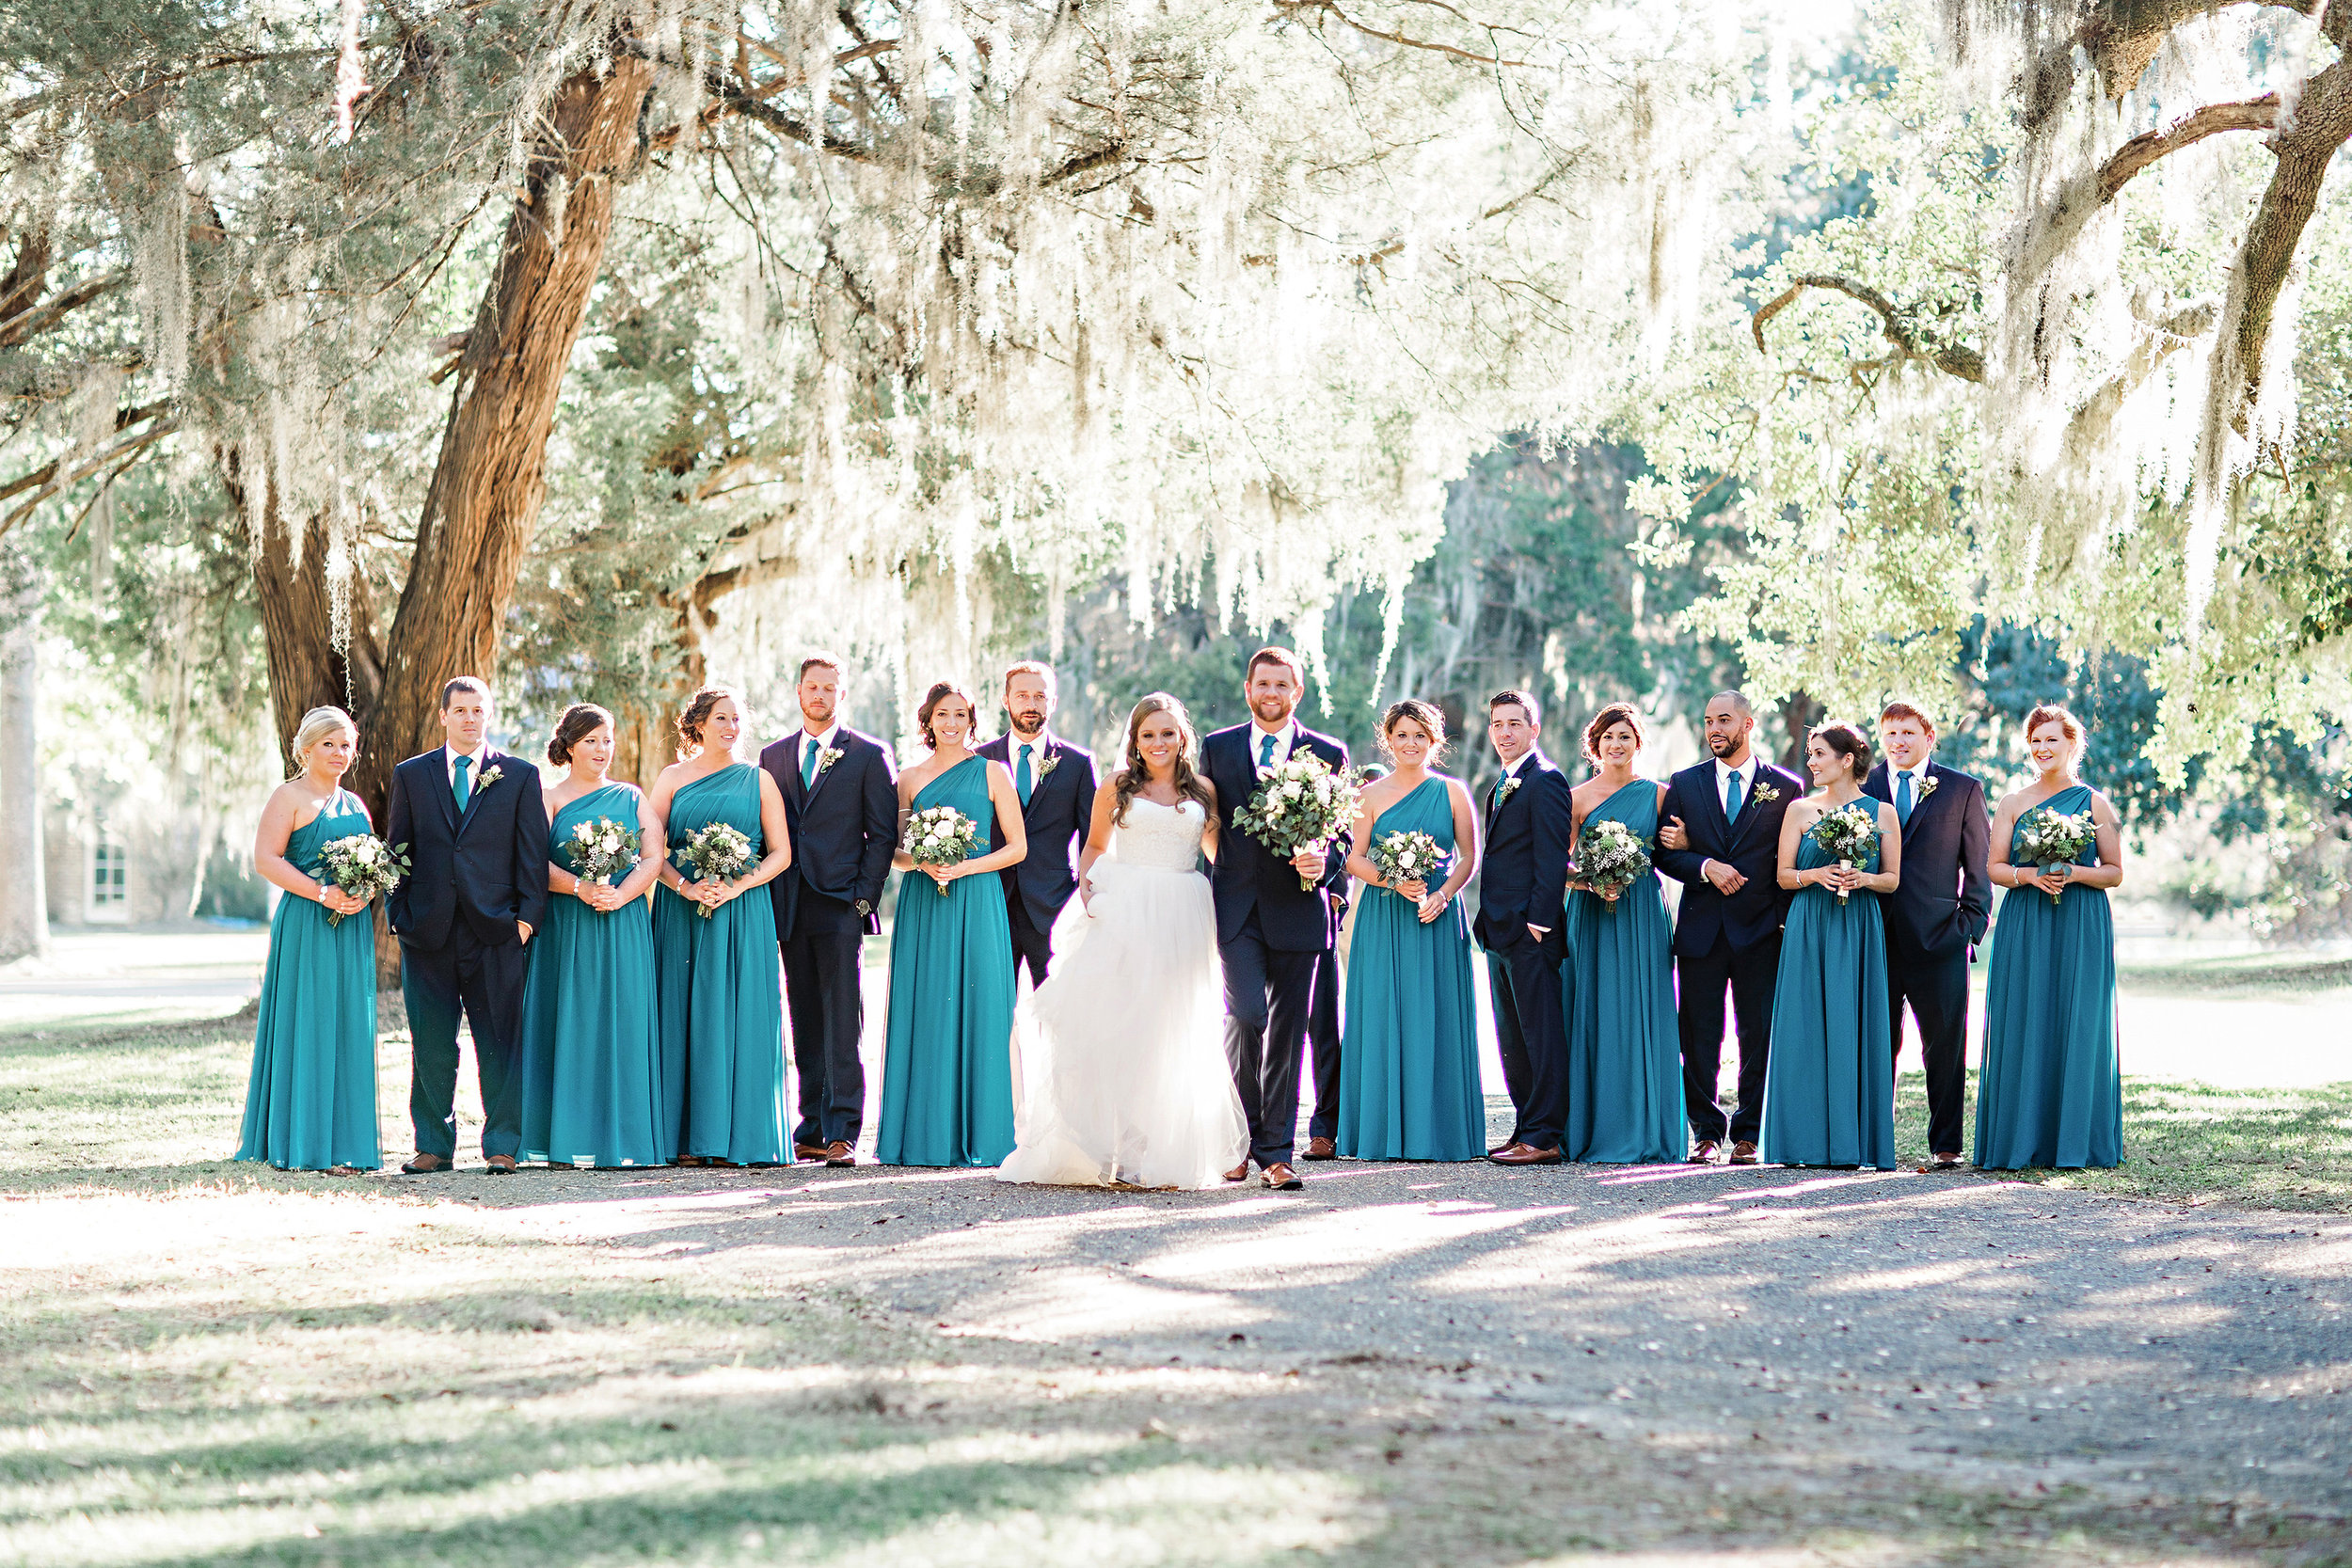 Ashton & Josh's LItchfield Plantation wedding by Corina Silva Studios on A Lowcountry Wedding Magazine